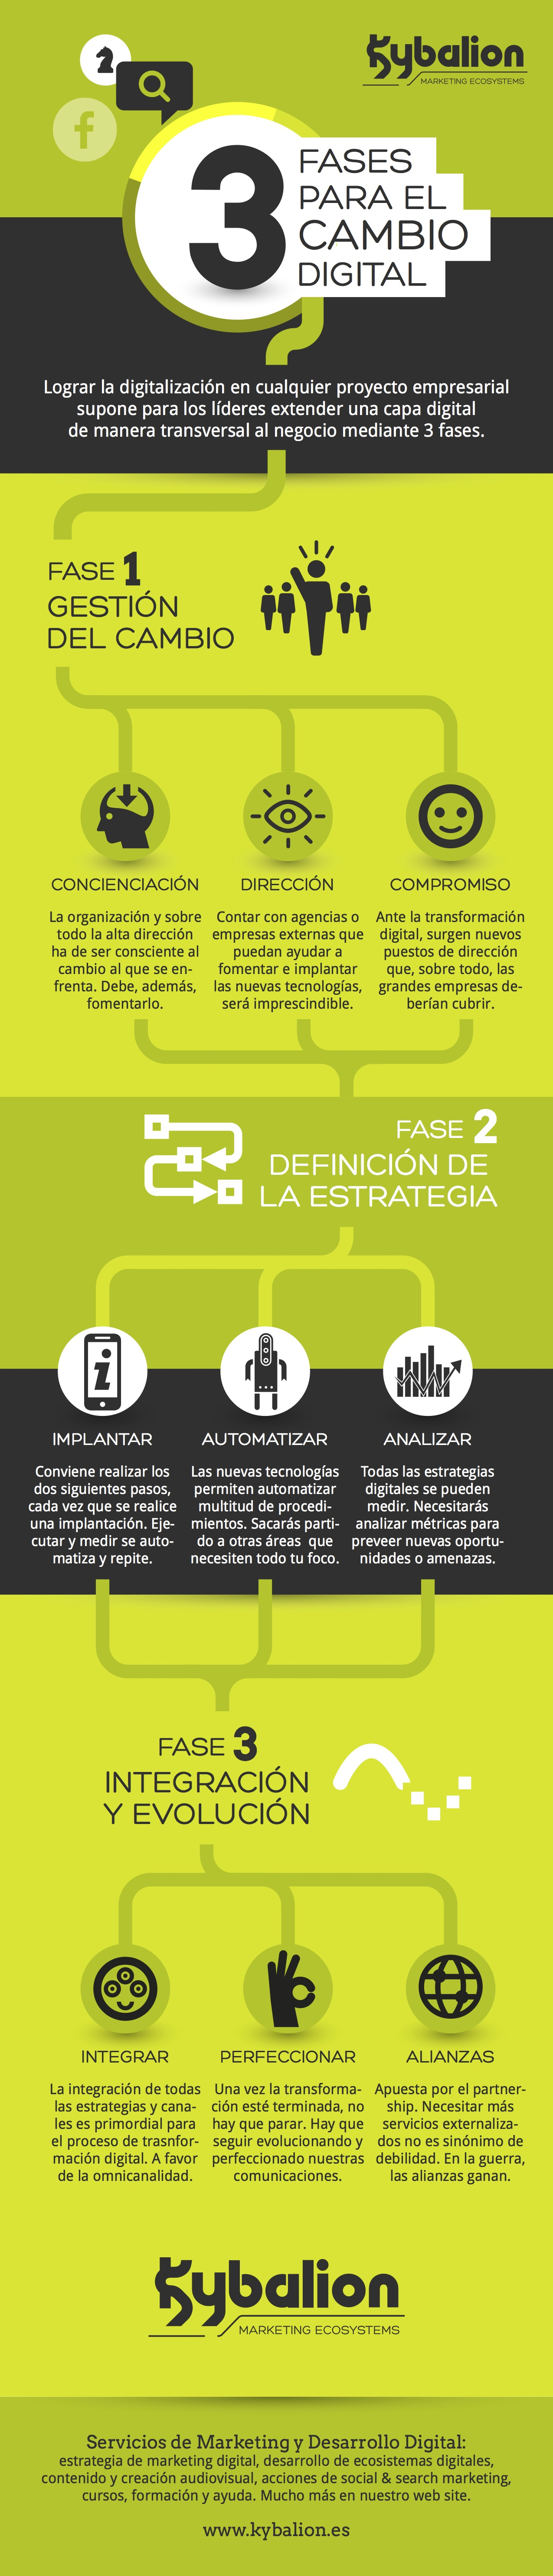 fases-transformacion-digital-infografia